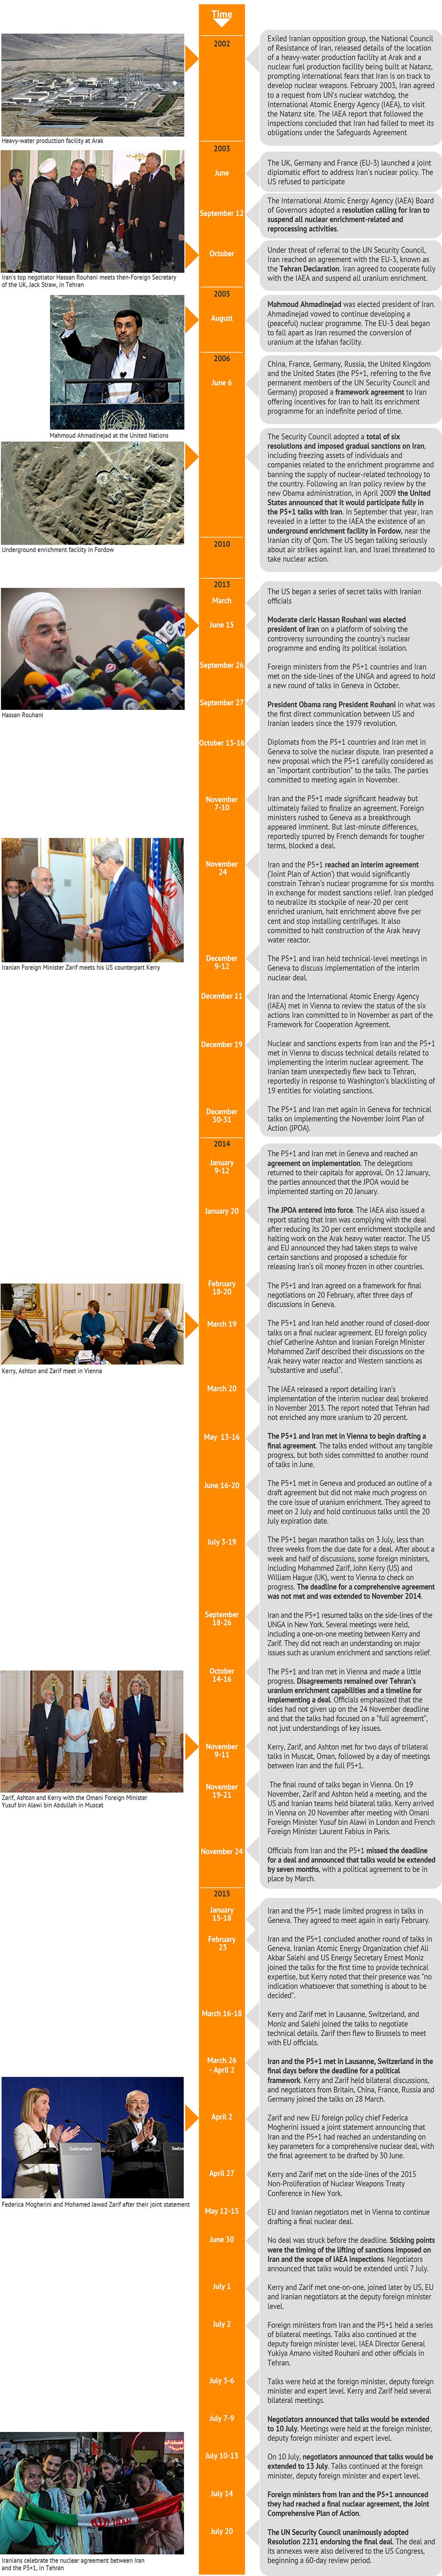 Iran nuclear programme negotiations chronology